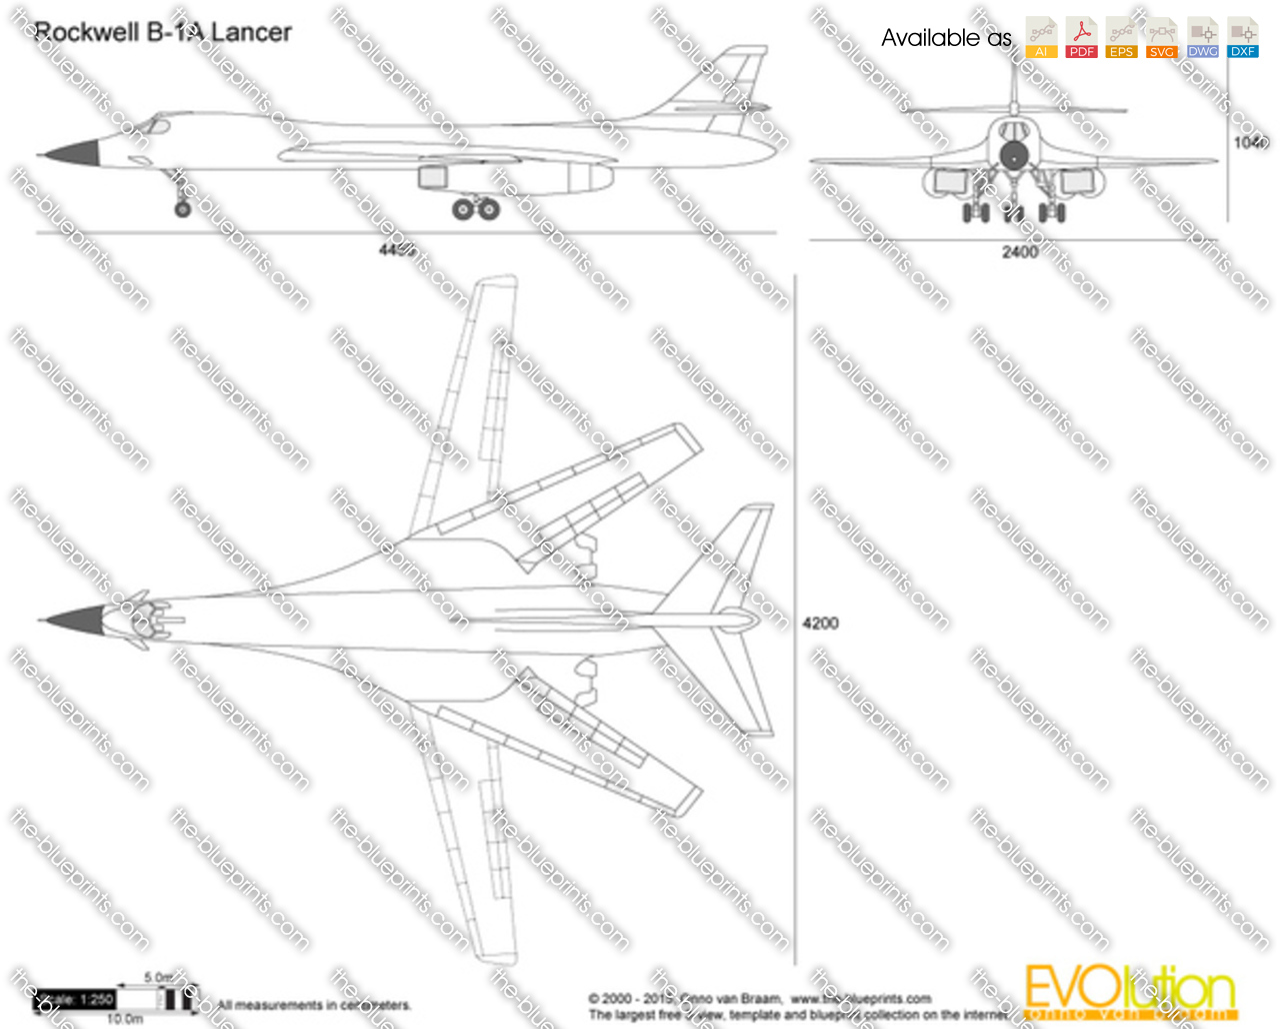 Rockwell B-1A Lancer